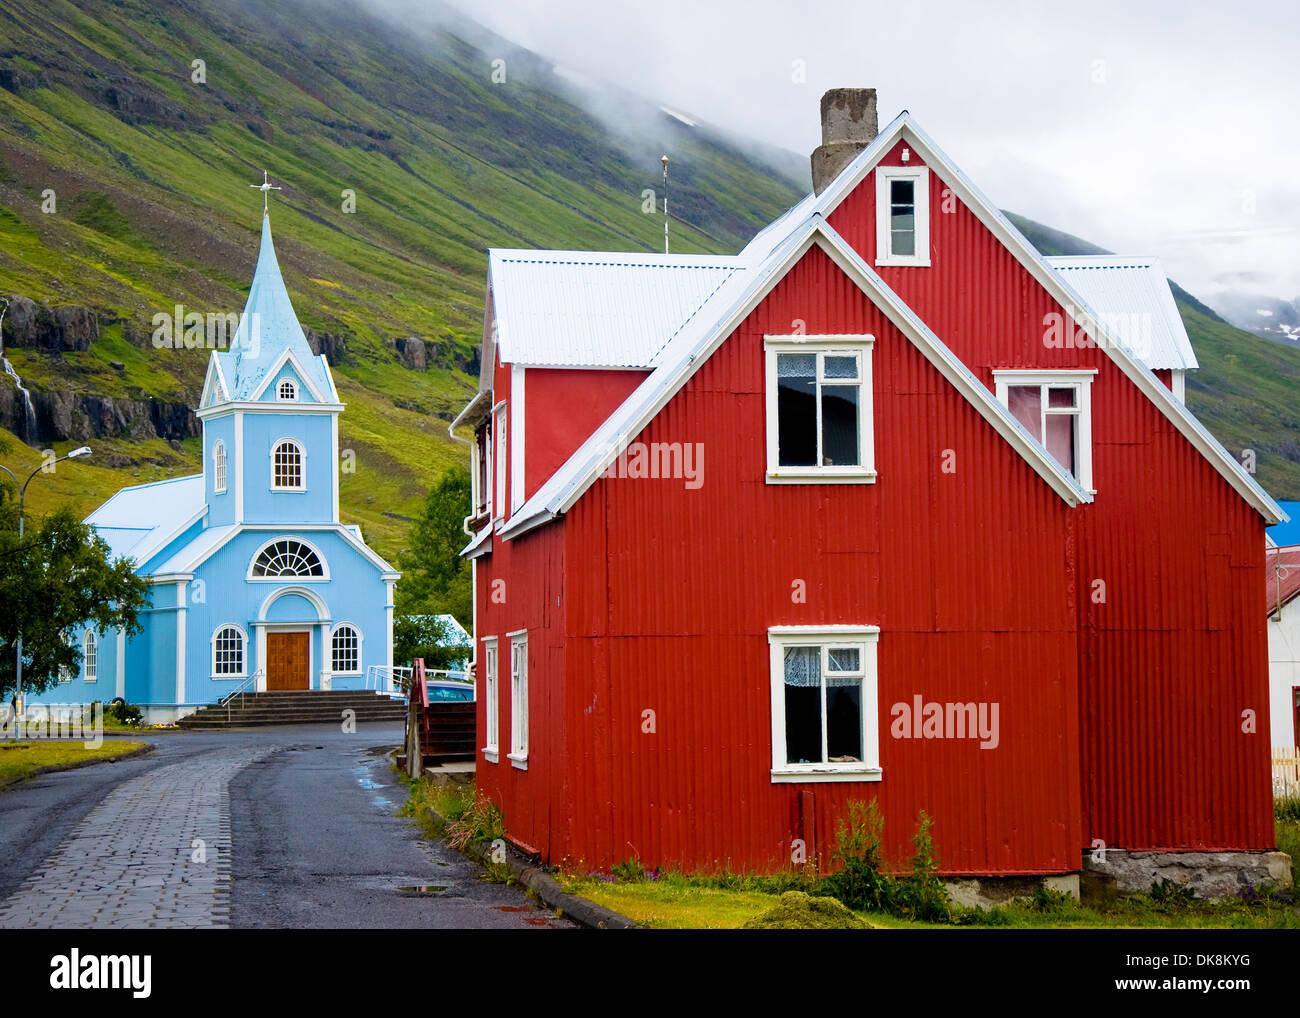 Colourful houses, Seydisfjordur, Iceland - Stock Image